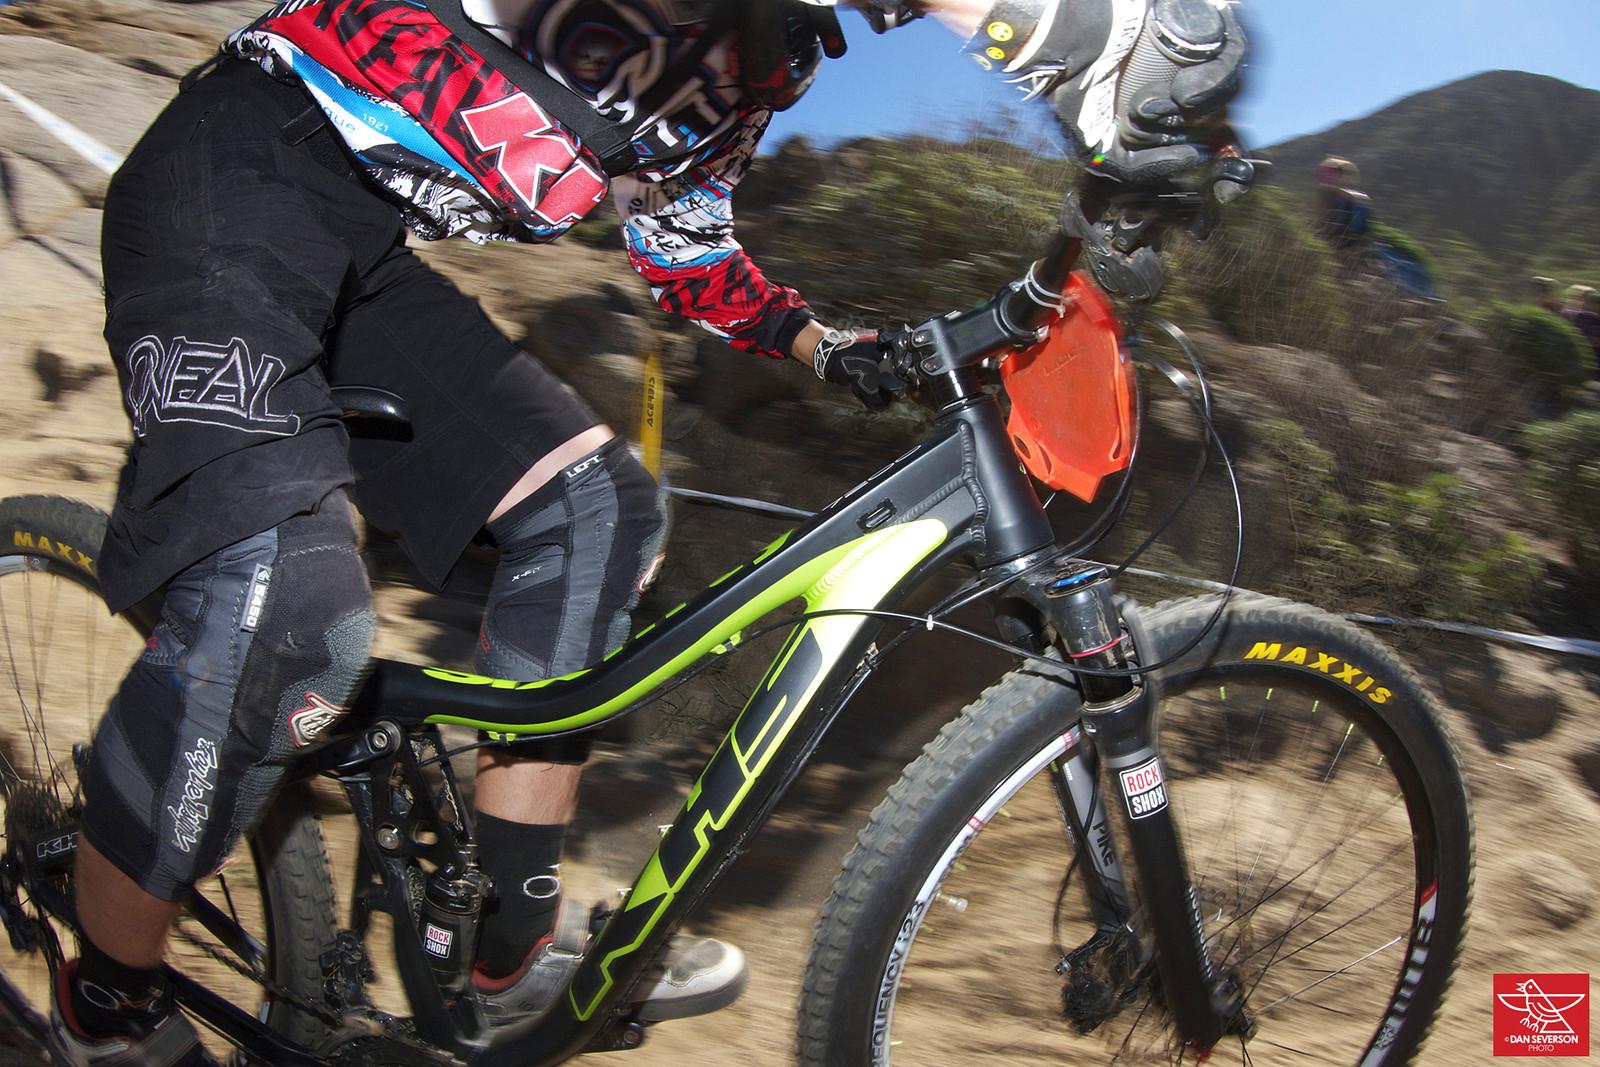 G-Out Project: Fontana 2015 - KHS - danseverson photo - Mountain Biking Pictures - Vital MTB